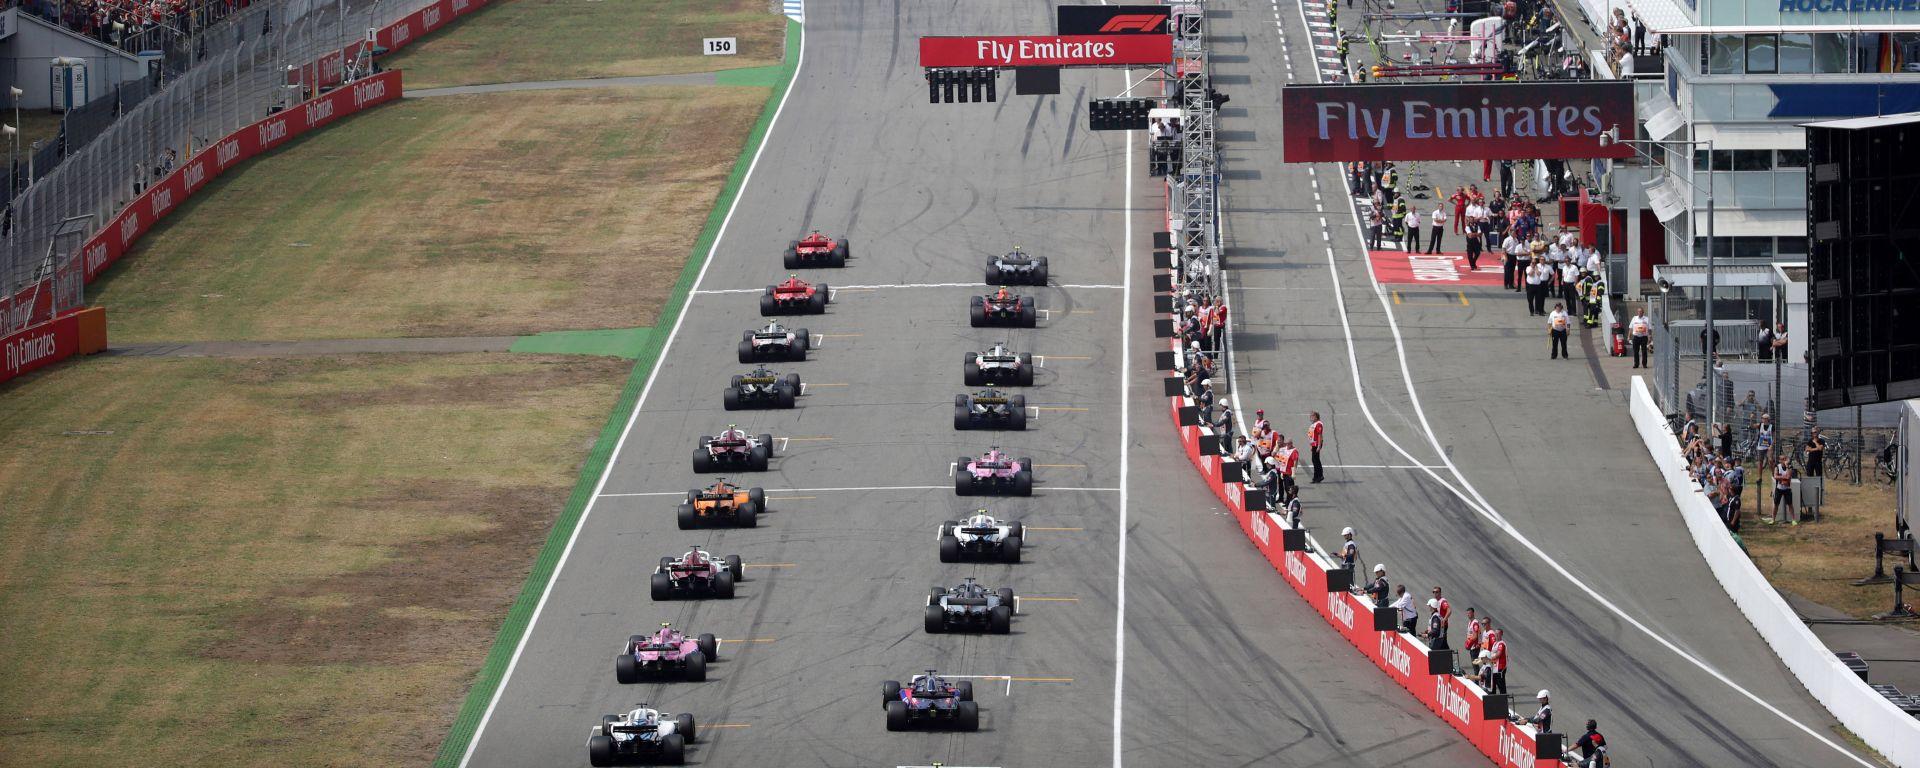 GP Germania 2018, Hockenheim, partenza